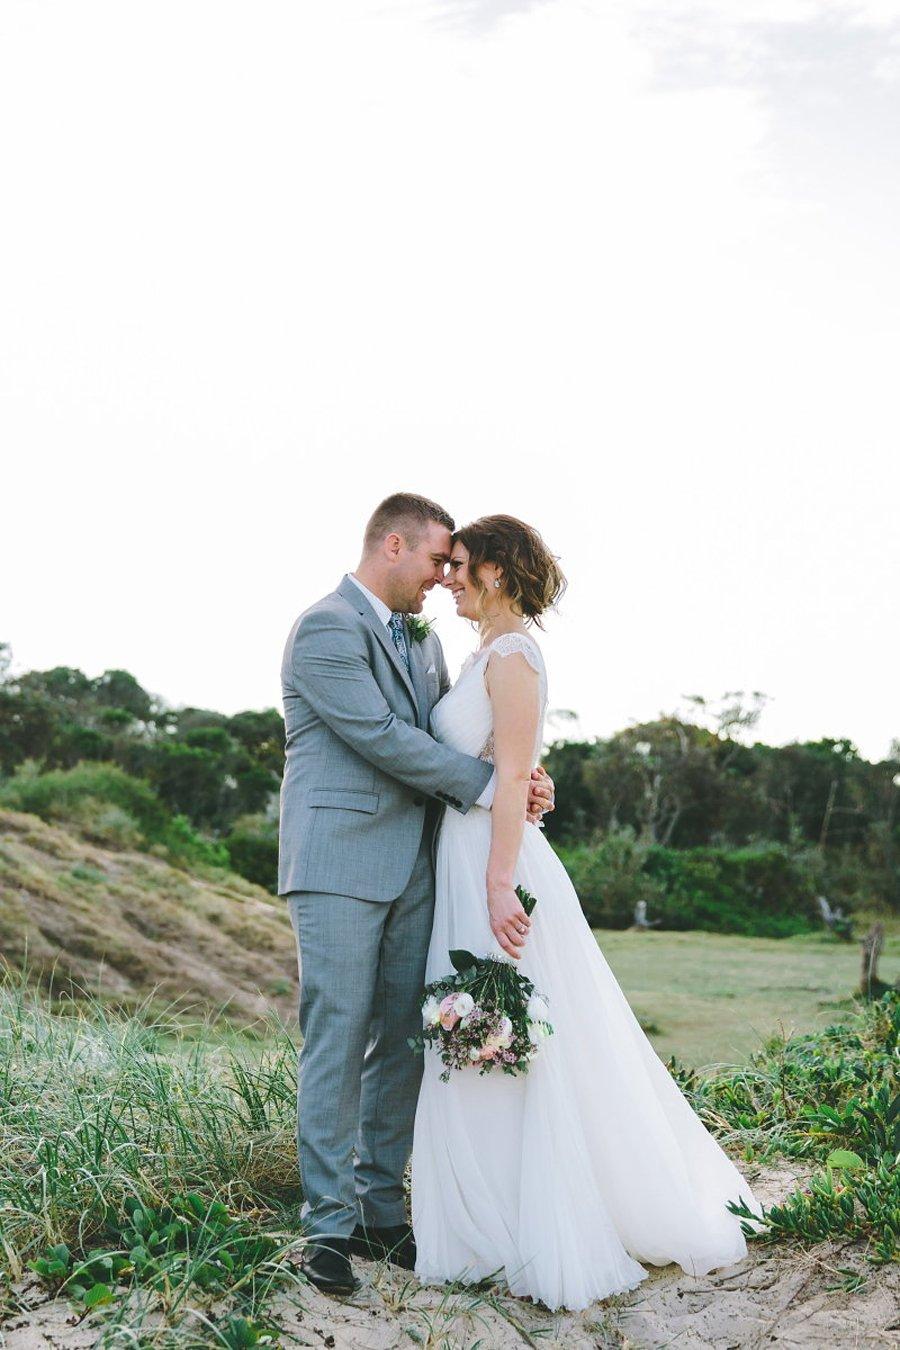 Scott and Krystal's Osteria Real Wedding Tweed Coast Wedding Venue - Photo045